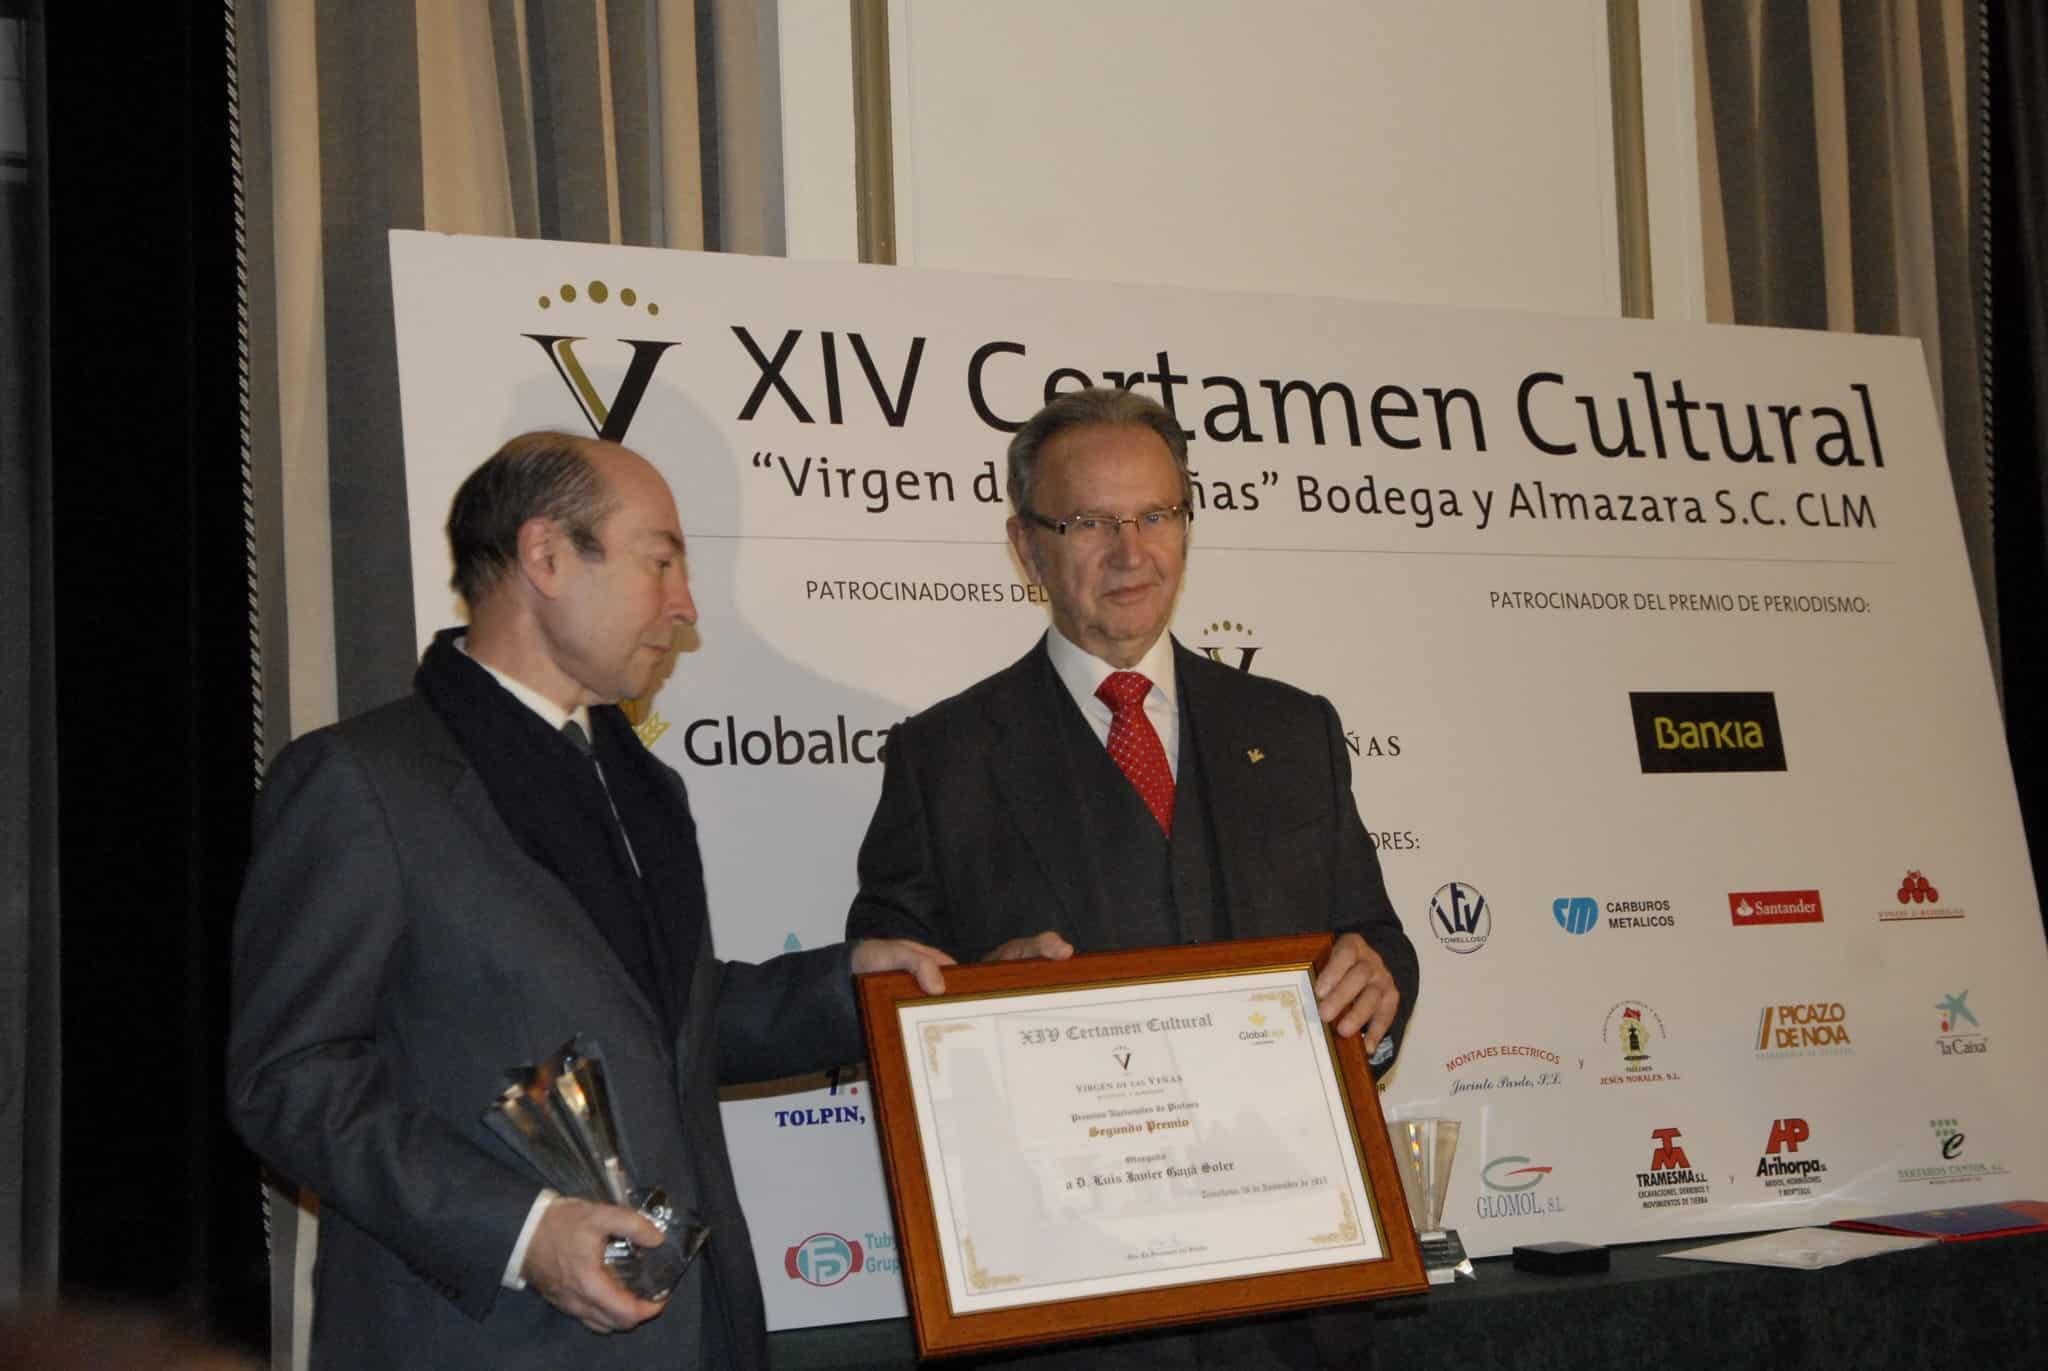 Globalcaja entrega el 2º premio de pintura del certamen cultural Virgen de las Viñas